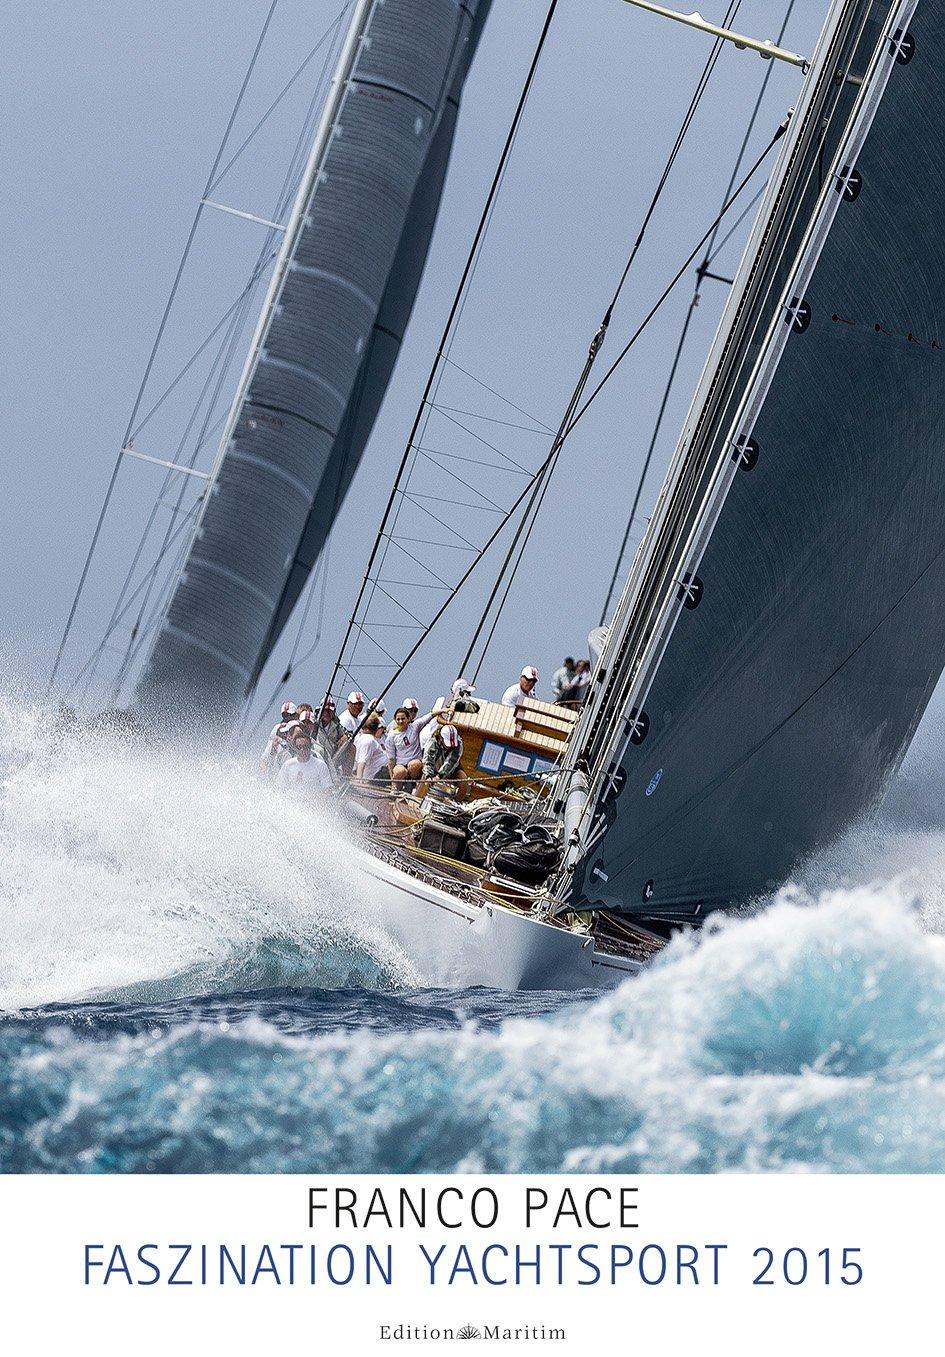 Faszination Yachtsport 2015